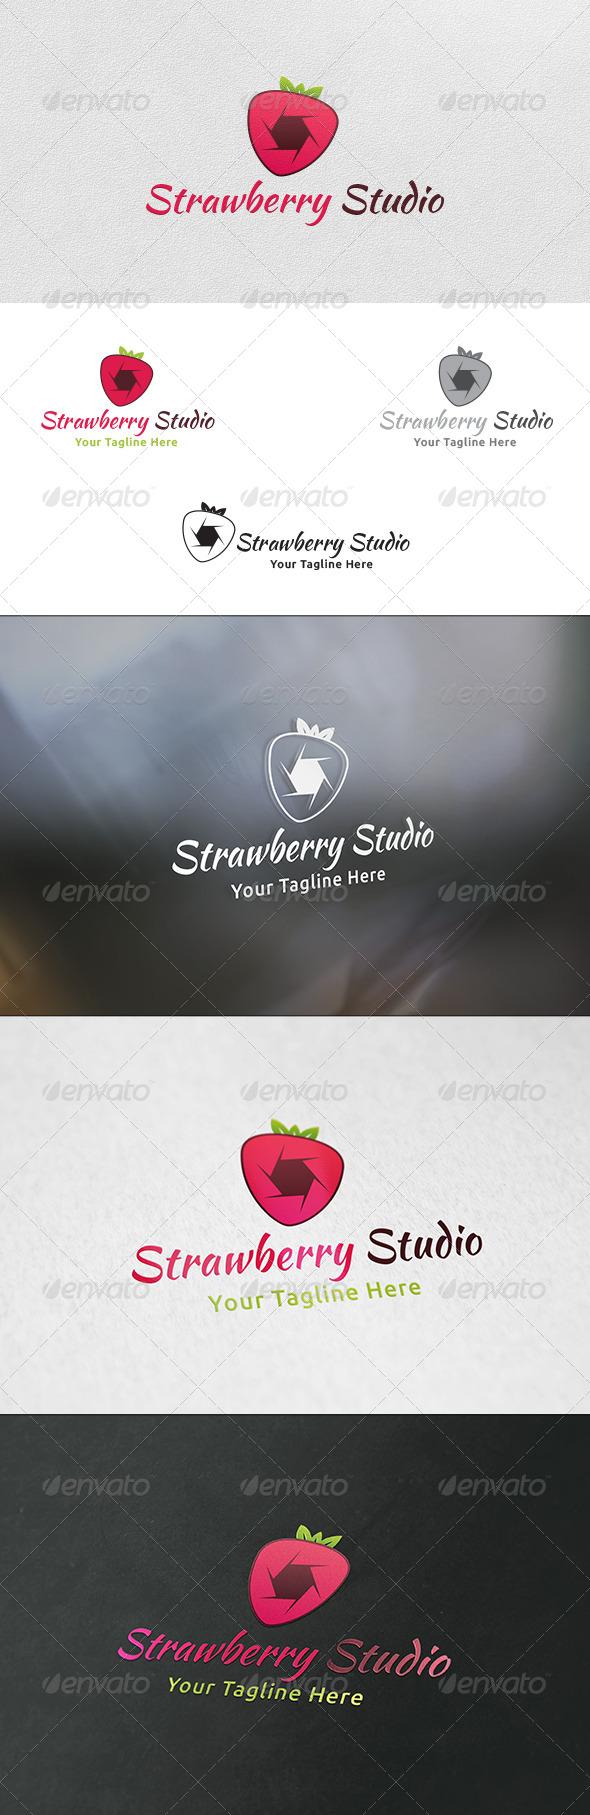 Strawberry Studio Logo Template